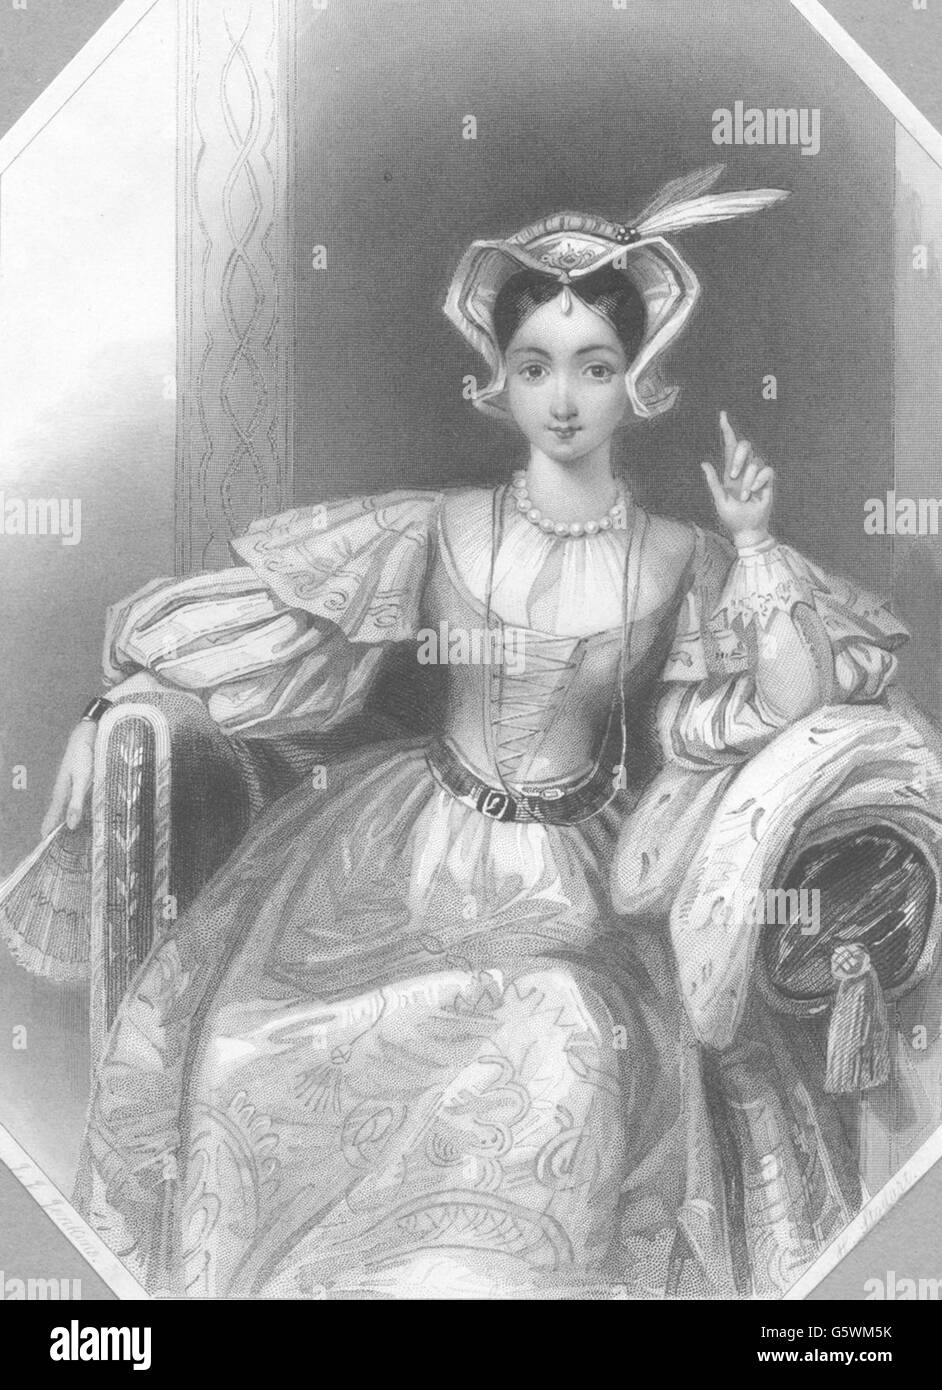 ROYALTY: Princess Katherine, antique print c1840 - Stock Image